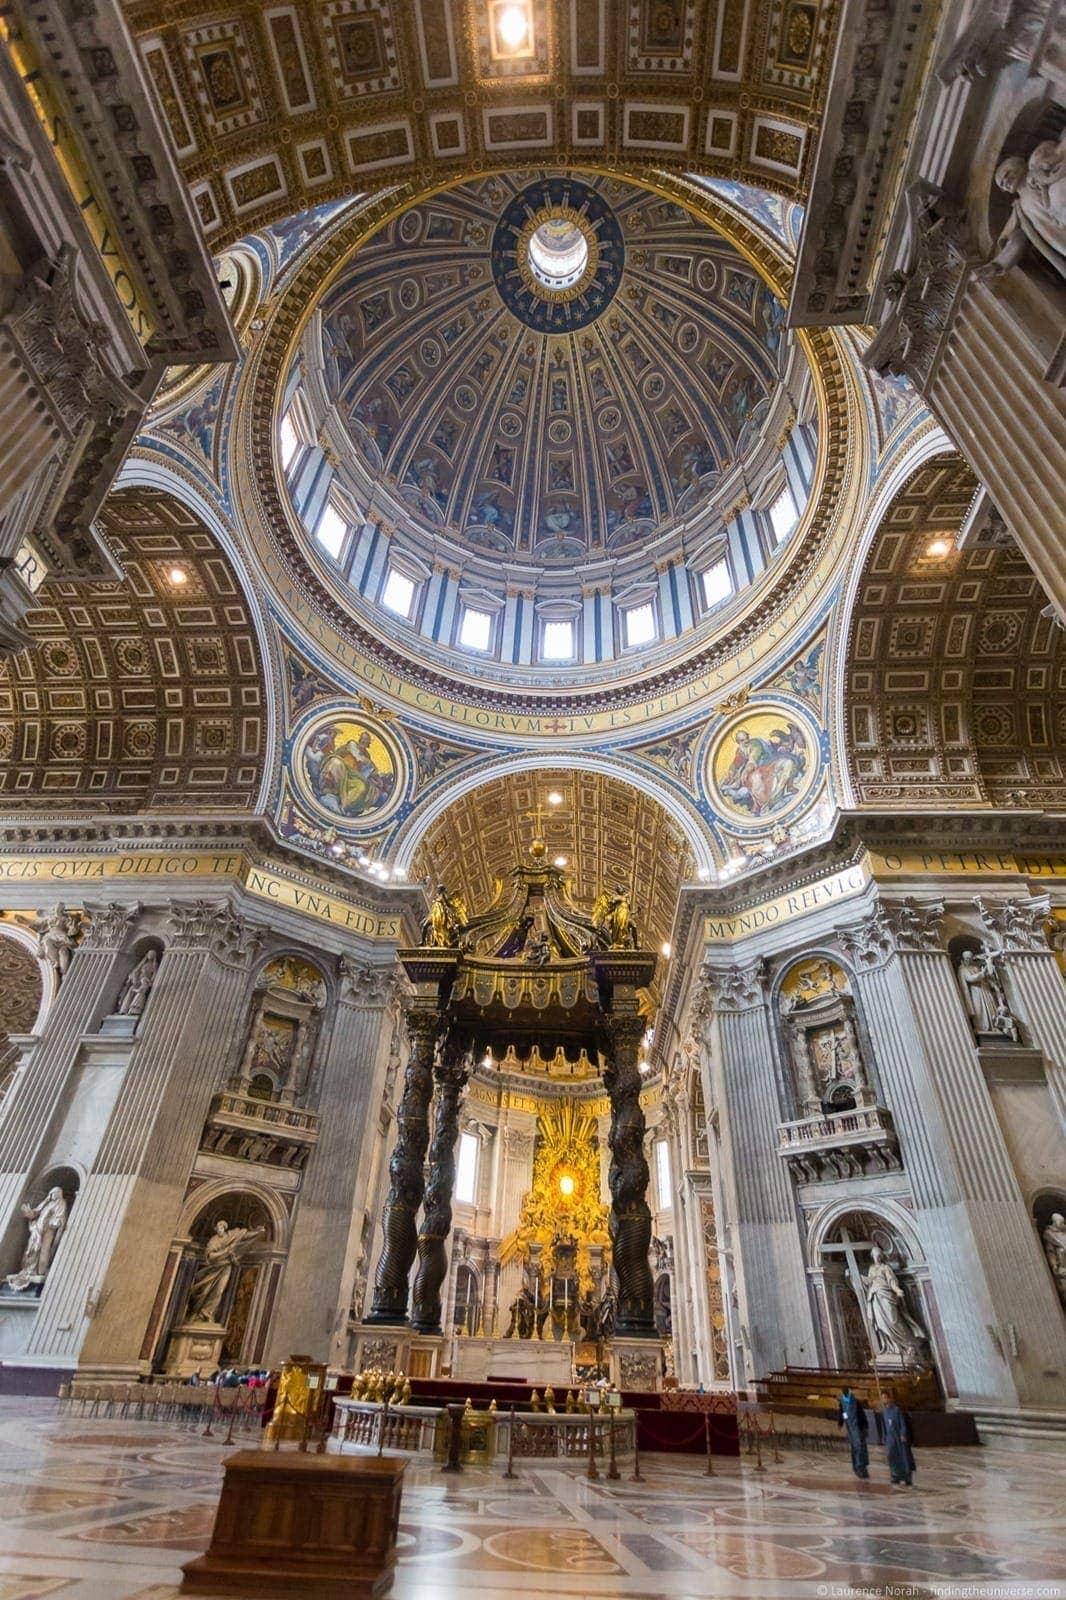 St Peters Basilica interior